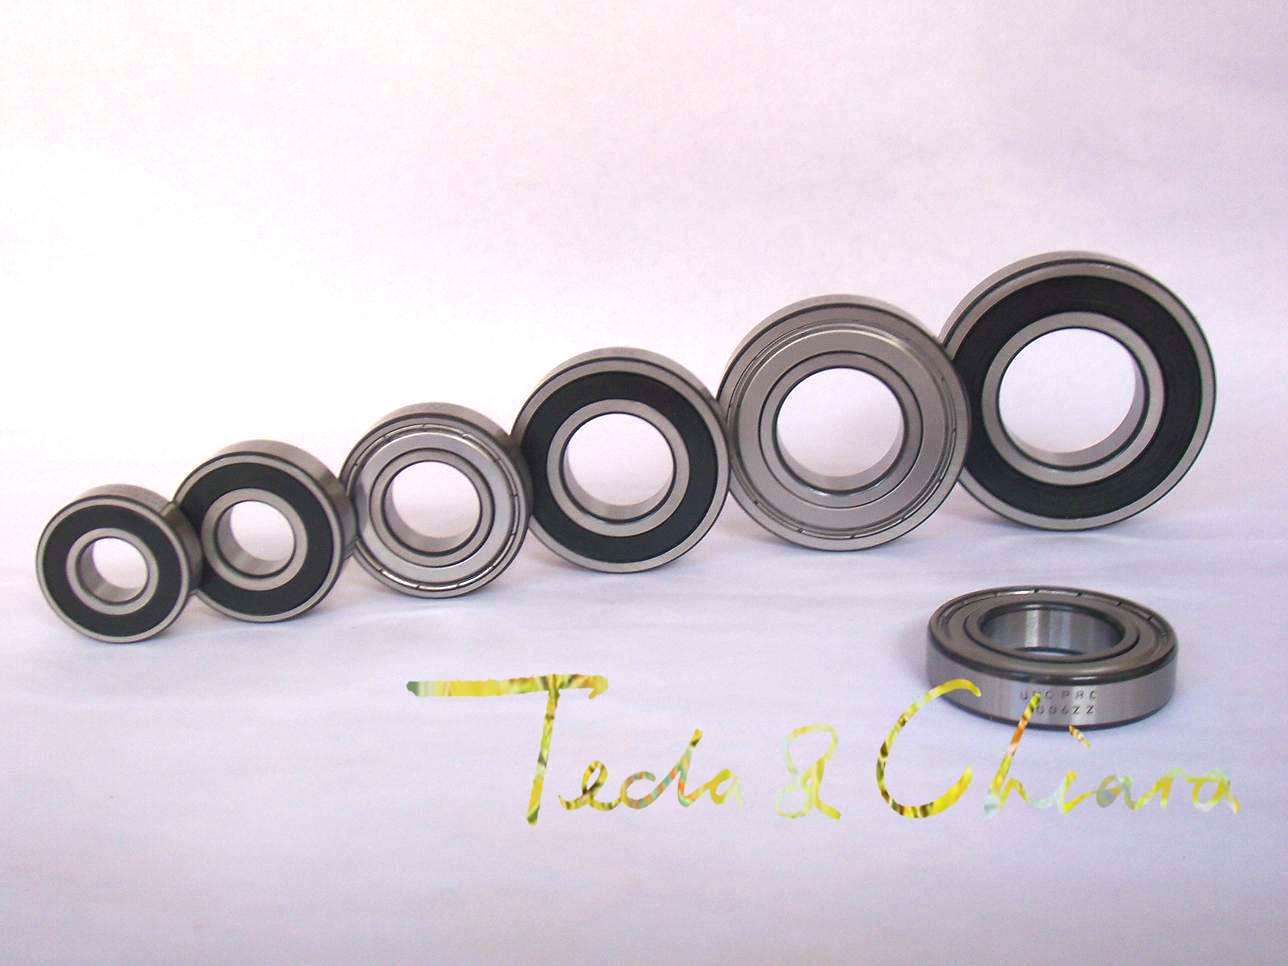 6707 6707ZZ 6707RS 6707-2Z 6707Z 6707-2RS ZZ RS RZ 2RZ Deep Groove Ball Bearings 35 x 44 x 5mm High Quality